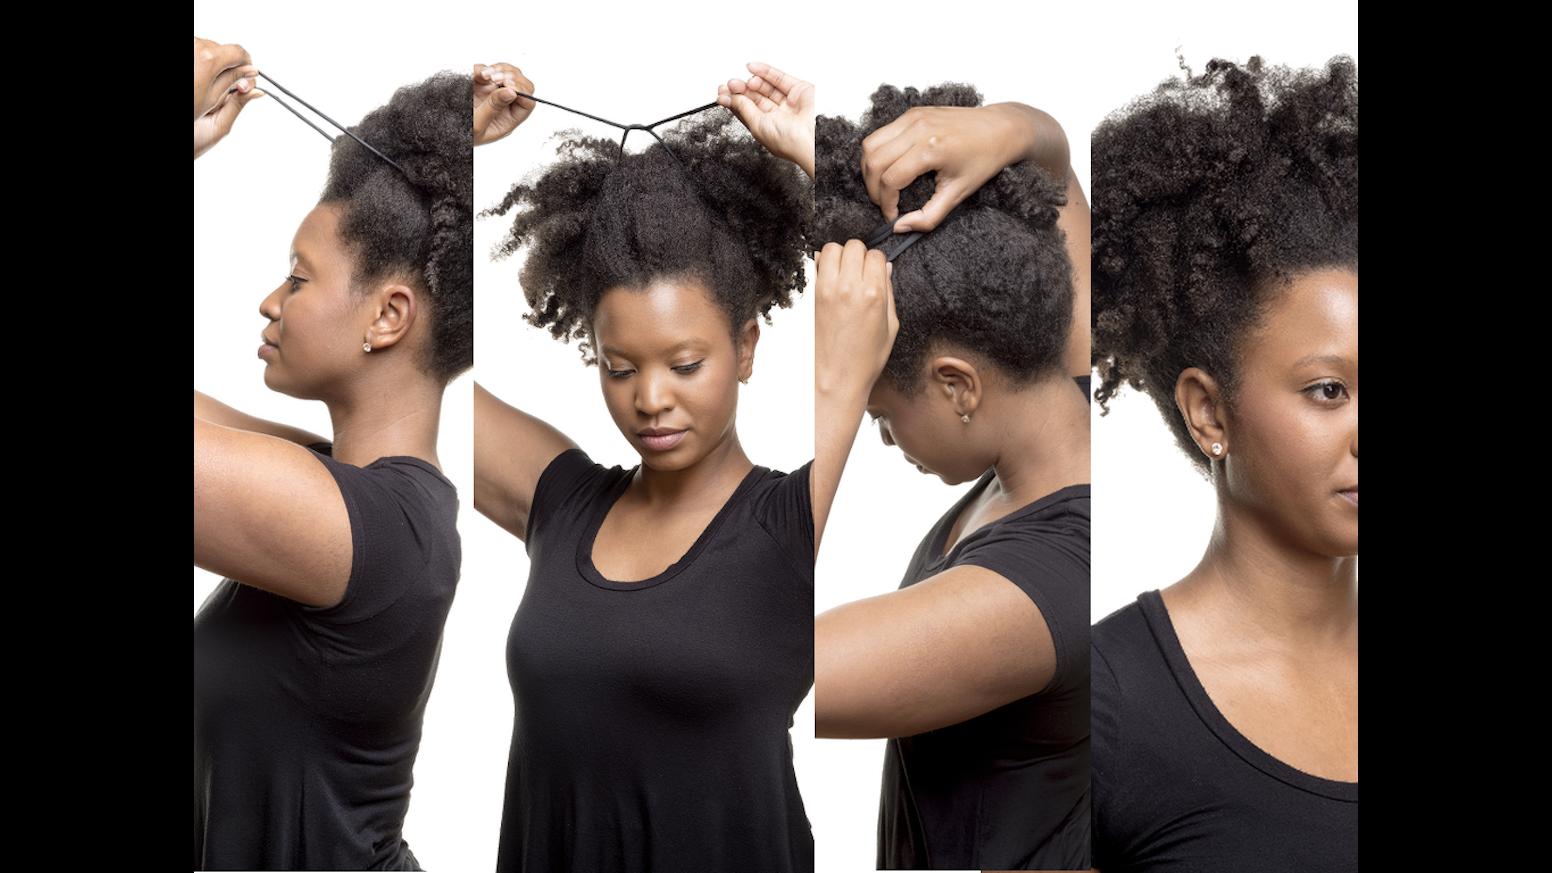 Pleasing Poof It Hair Tool Your Curls Your Way By Jennifer Harris Short Hairstyles Gunalazisus